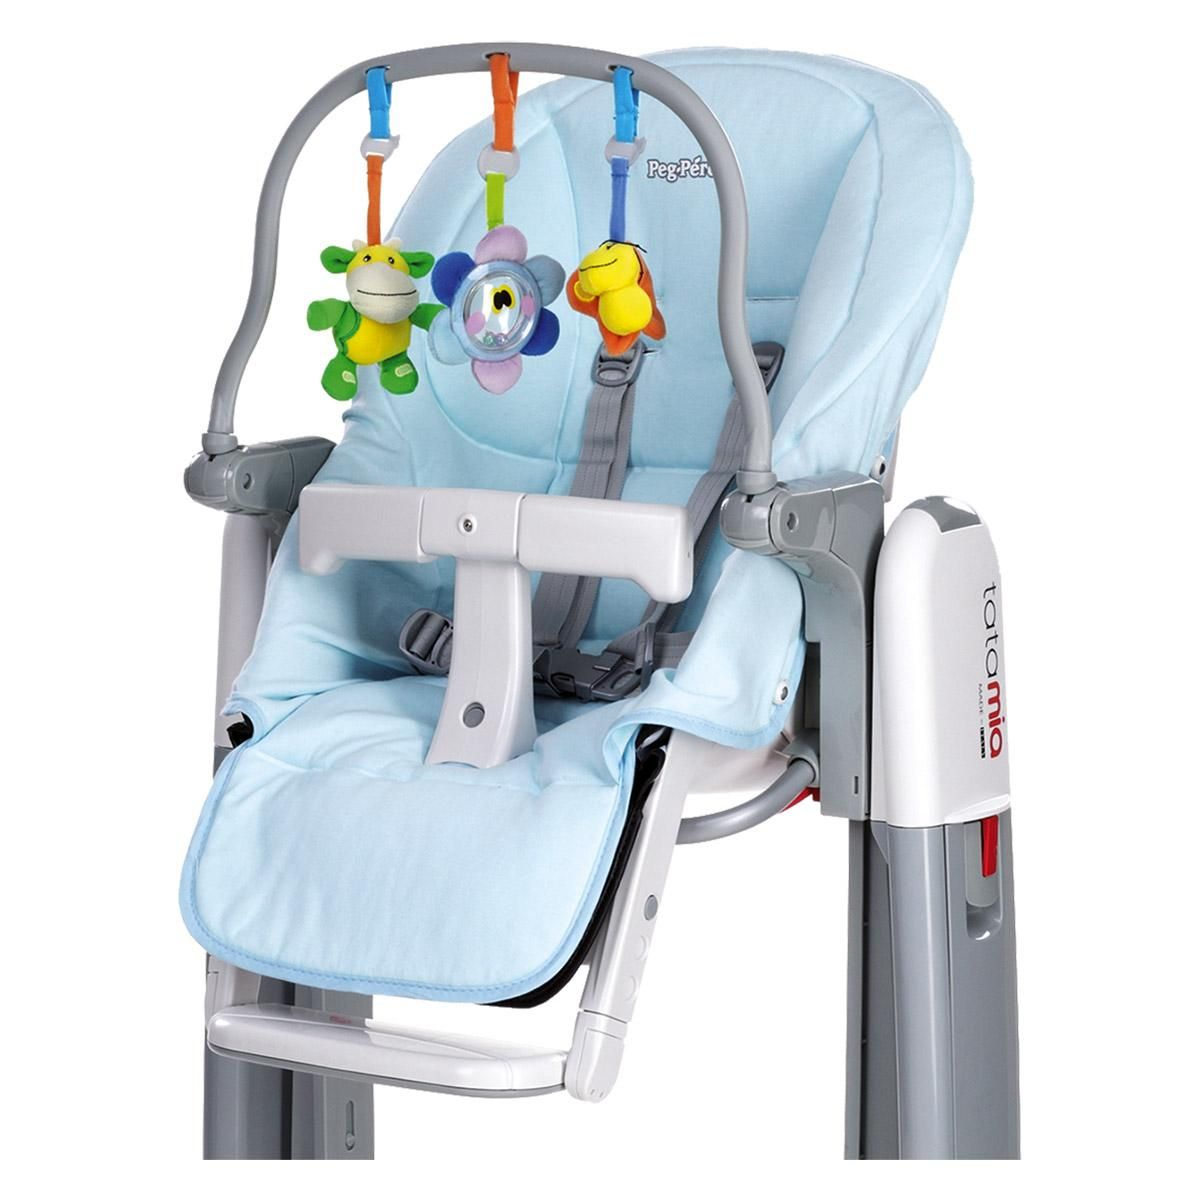 Kit Tatamia Siesta Newborn Azzuro 30169 Peg Perego Baby Chair